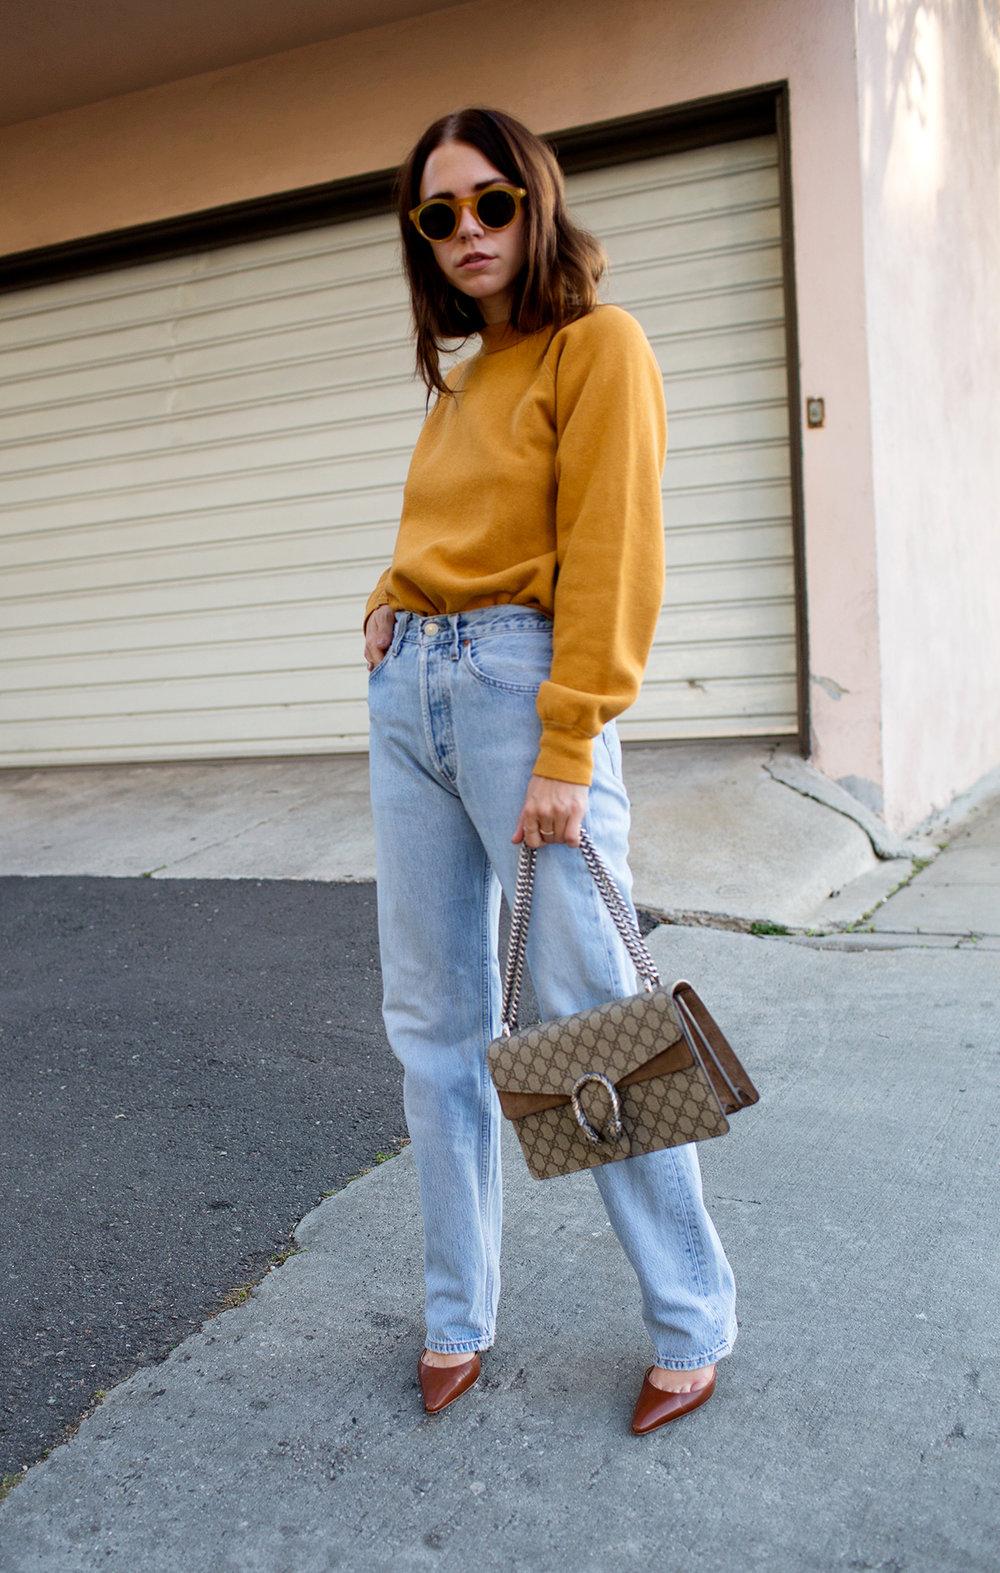 Vintage-Yellow-Sweatshirt-1.jpg